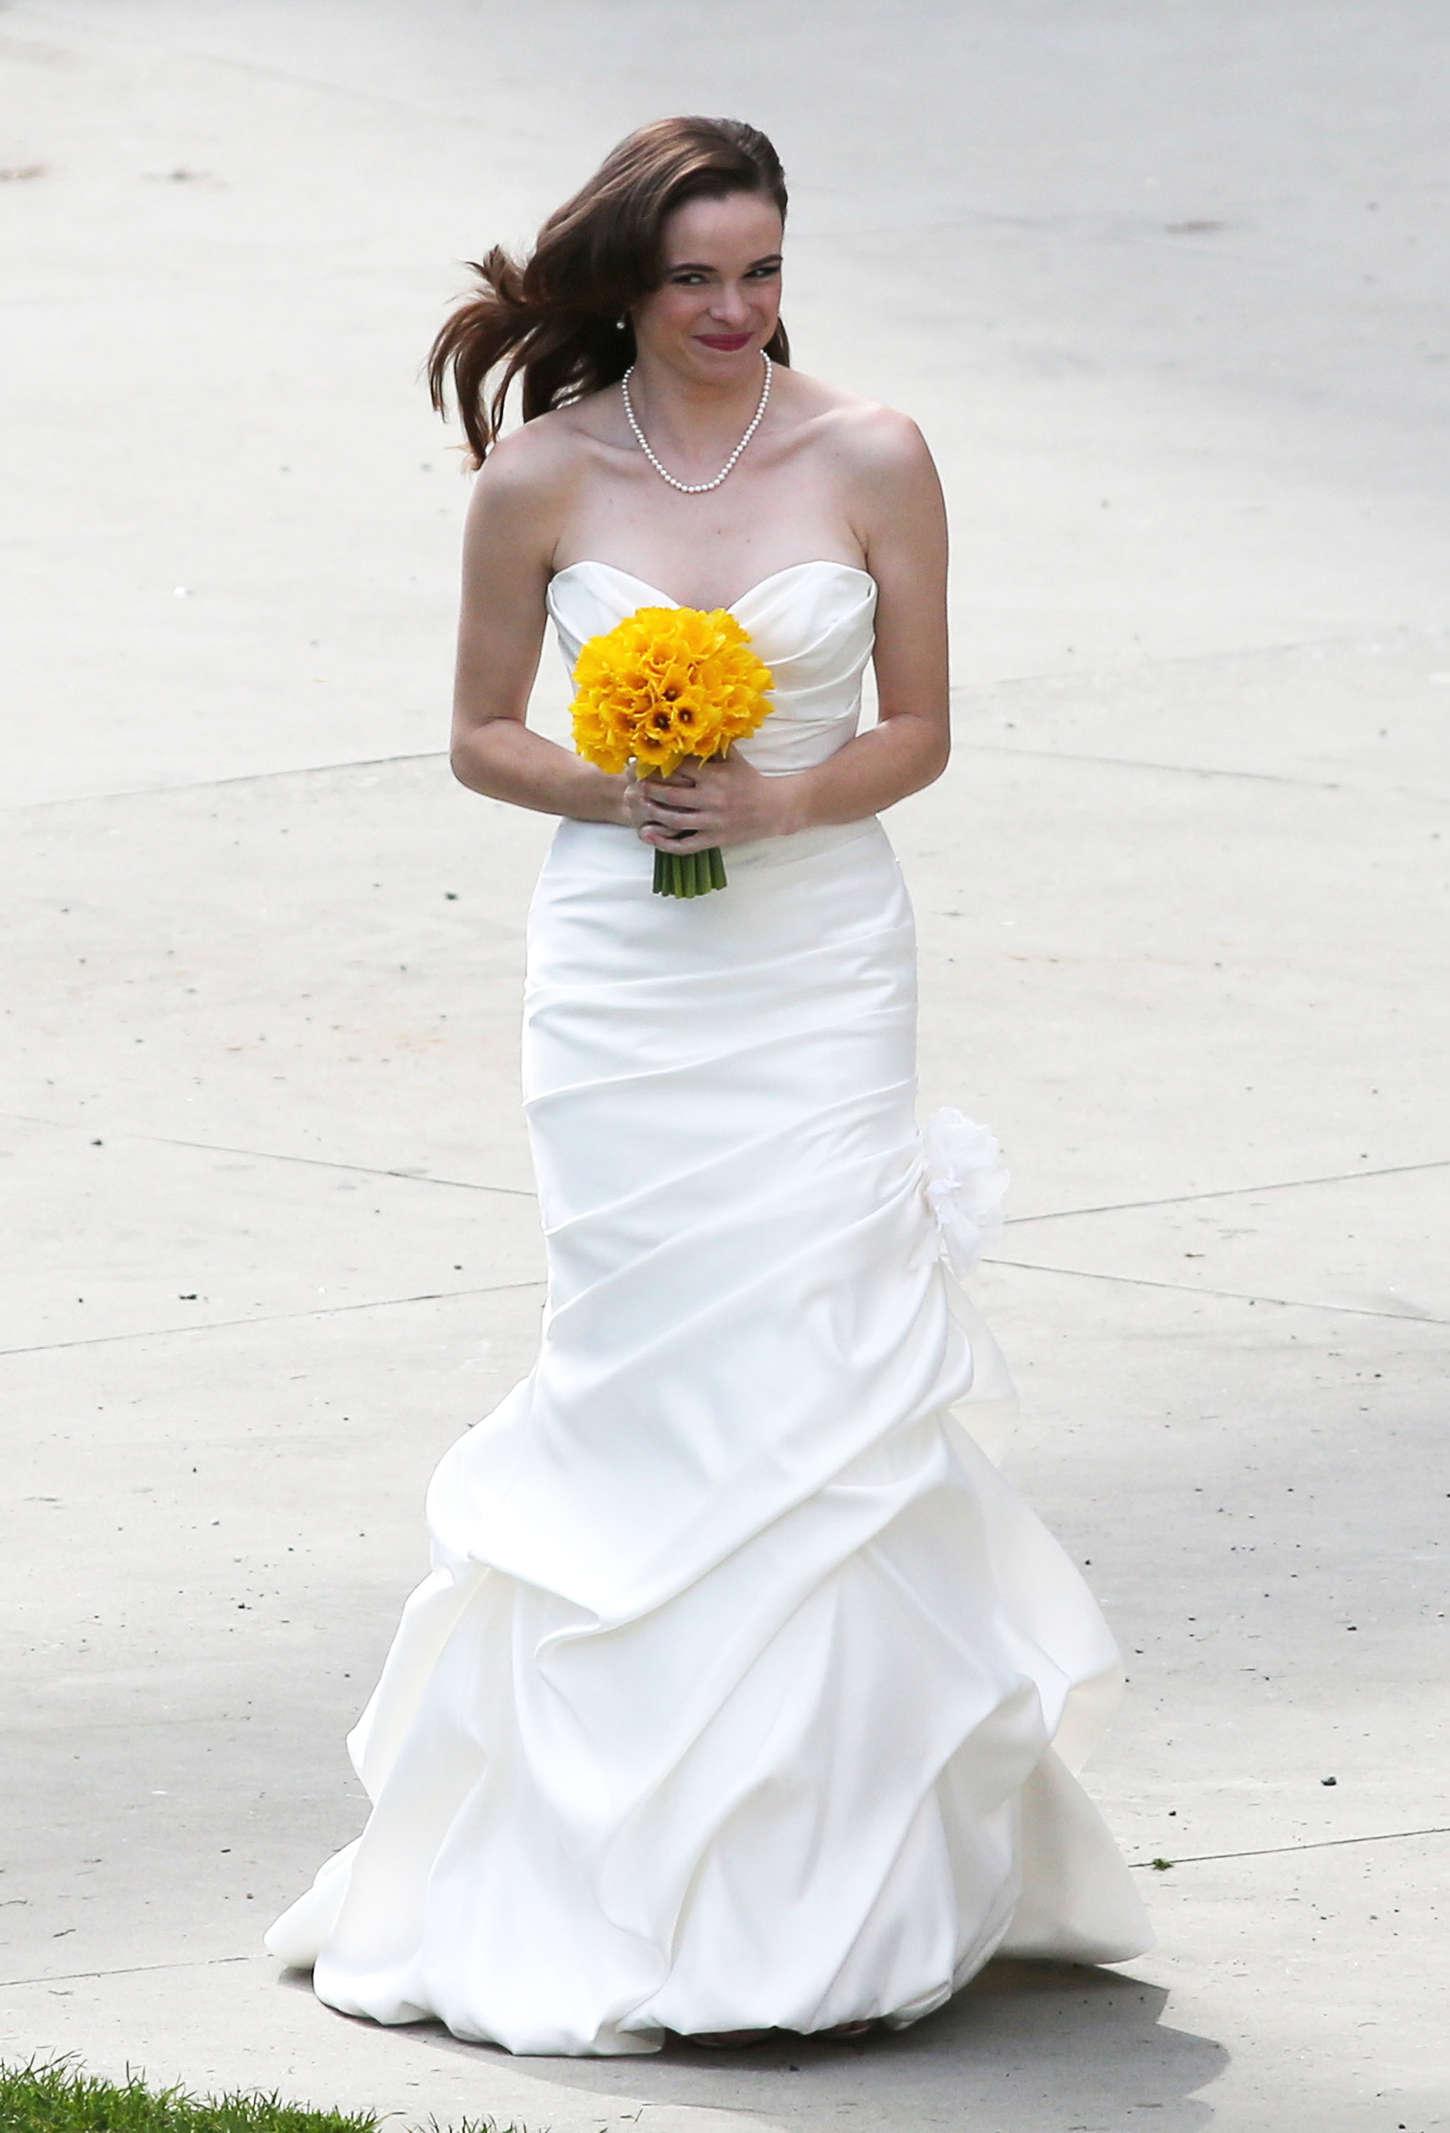 Daniel schon wedding